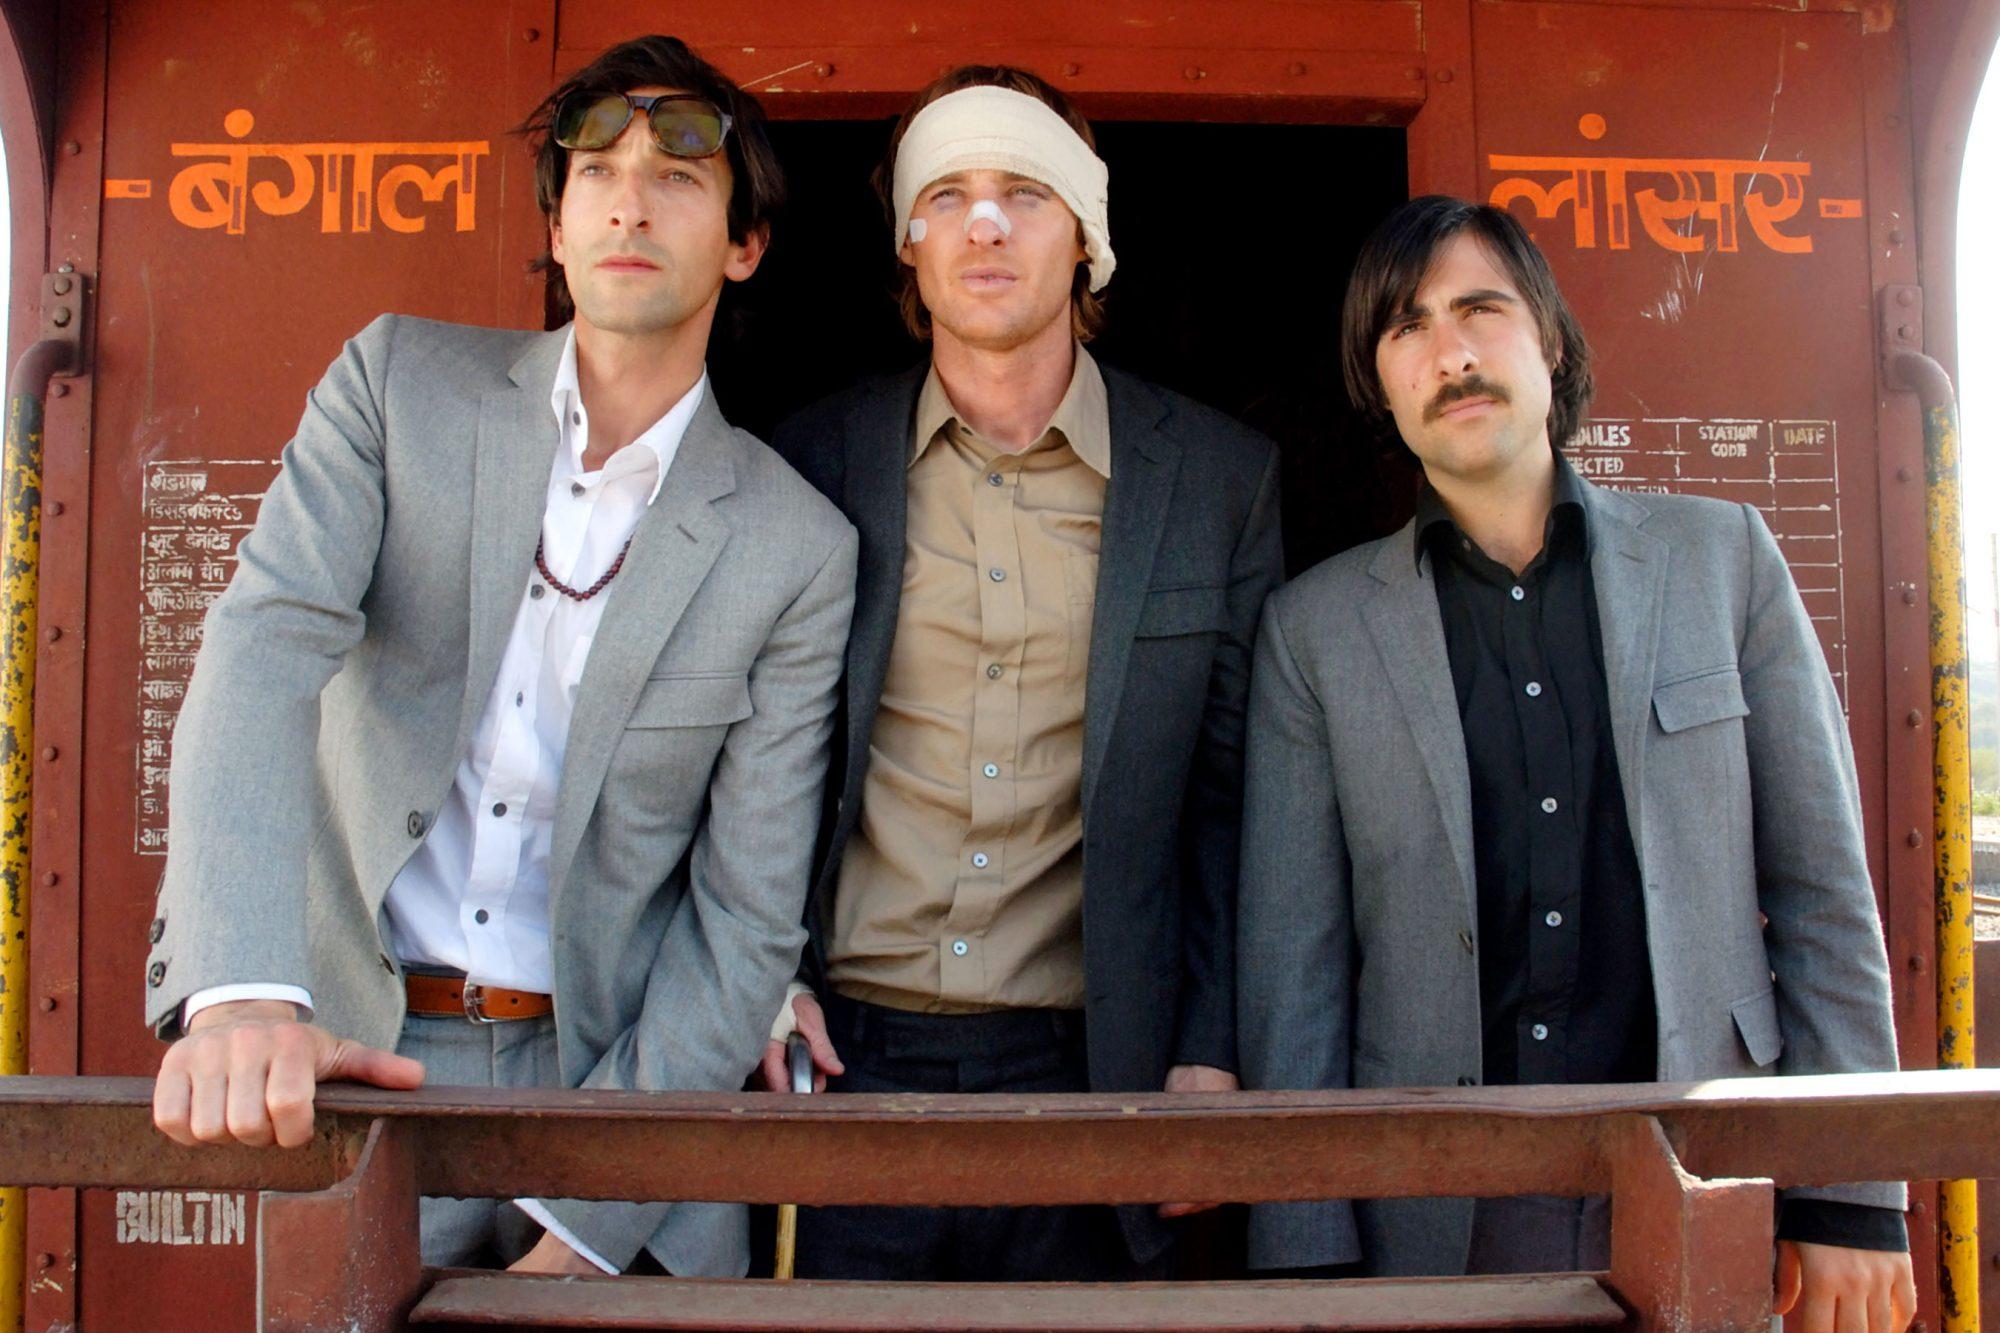 THE DARJEELING LIMITED,  Adrien Brody, Owen Wilson, Jason Schwartzman, 2007. ©Fox Searchlight/courte